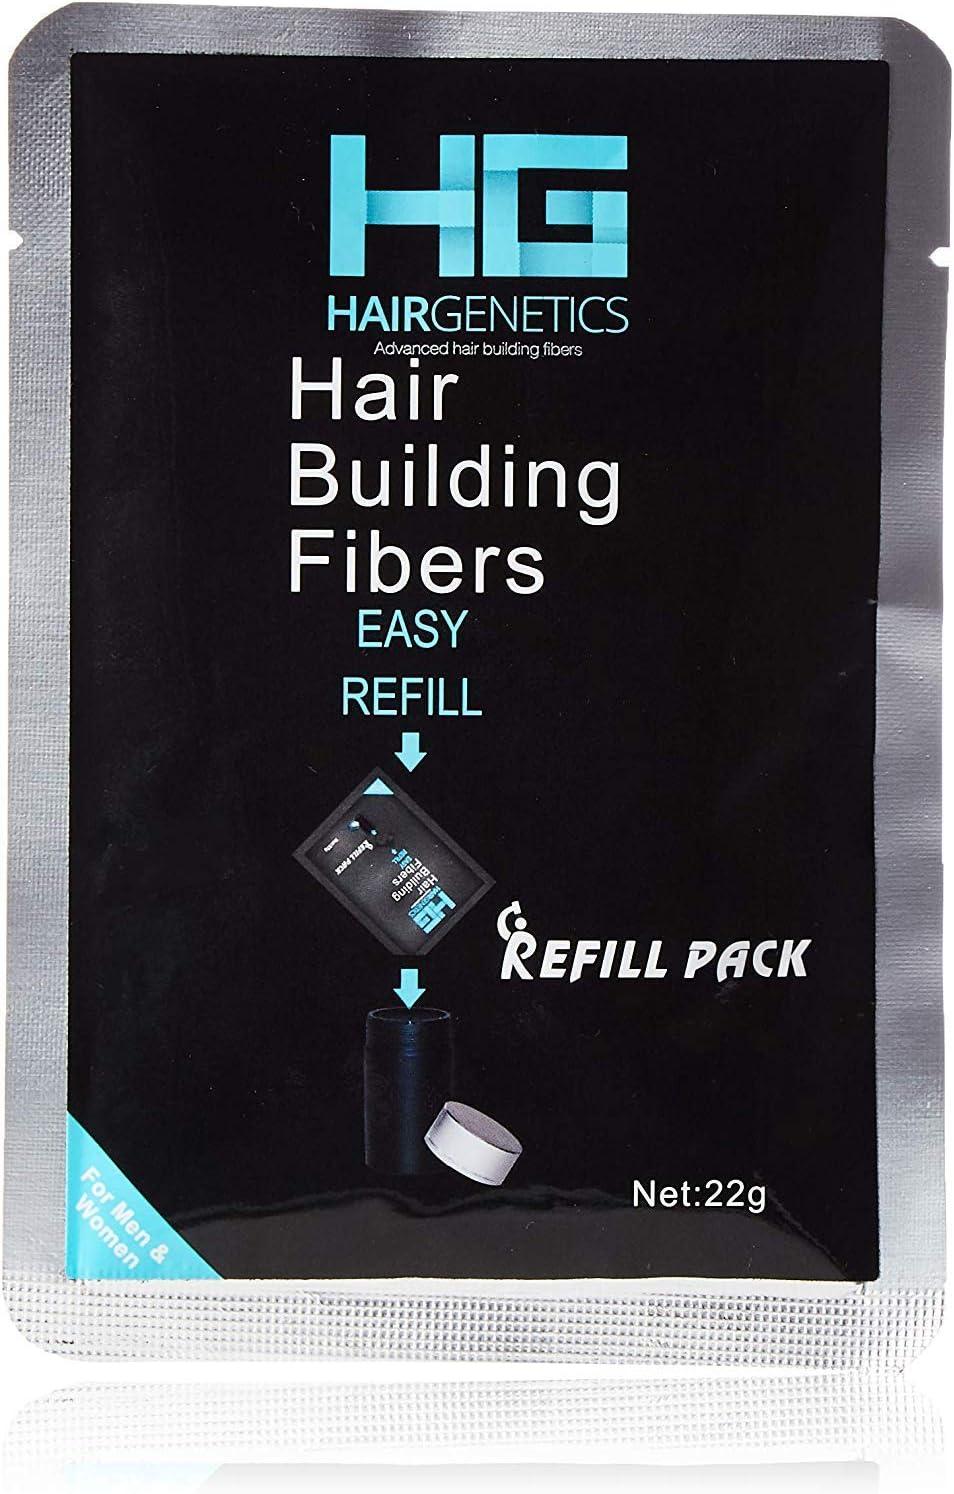 Hair Genetics® Fibras Capilares de Queratina para Cabello - Fórmula Avanzada Cero Picores de Calidad Profesional y Aspecto Natural para Hombres y Mujeres con Pelo - Pack Recarga 22 g… (Negro)